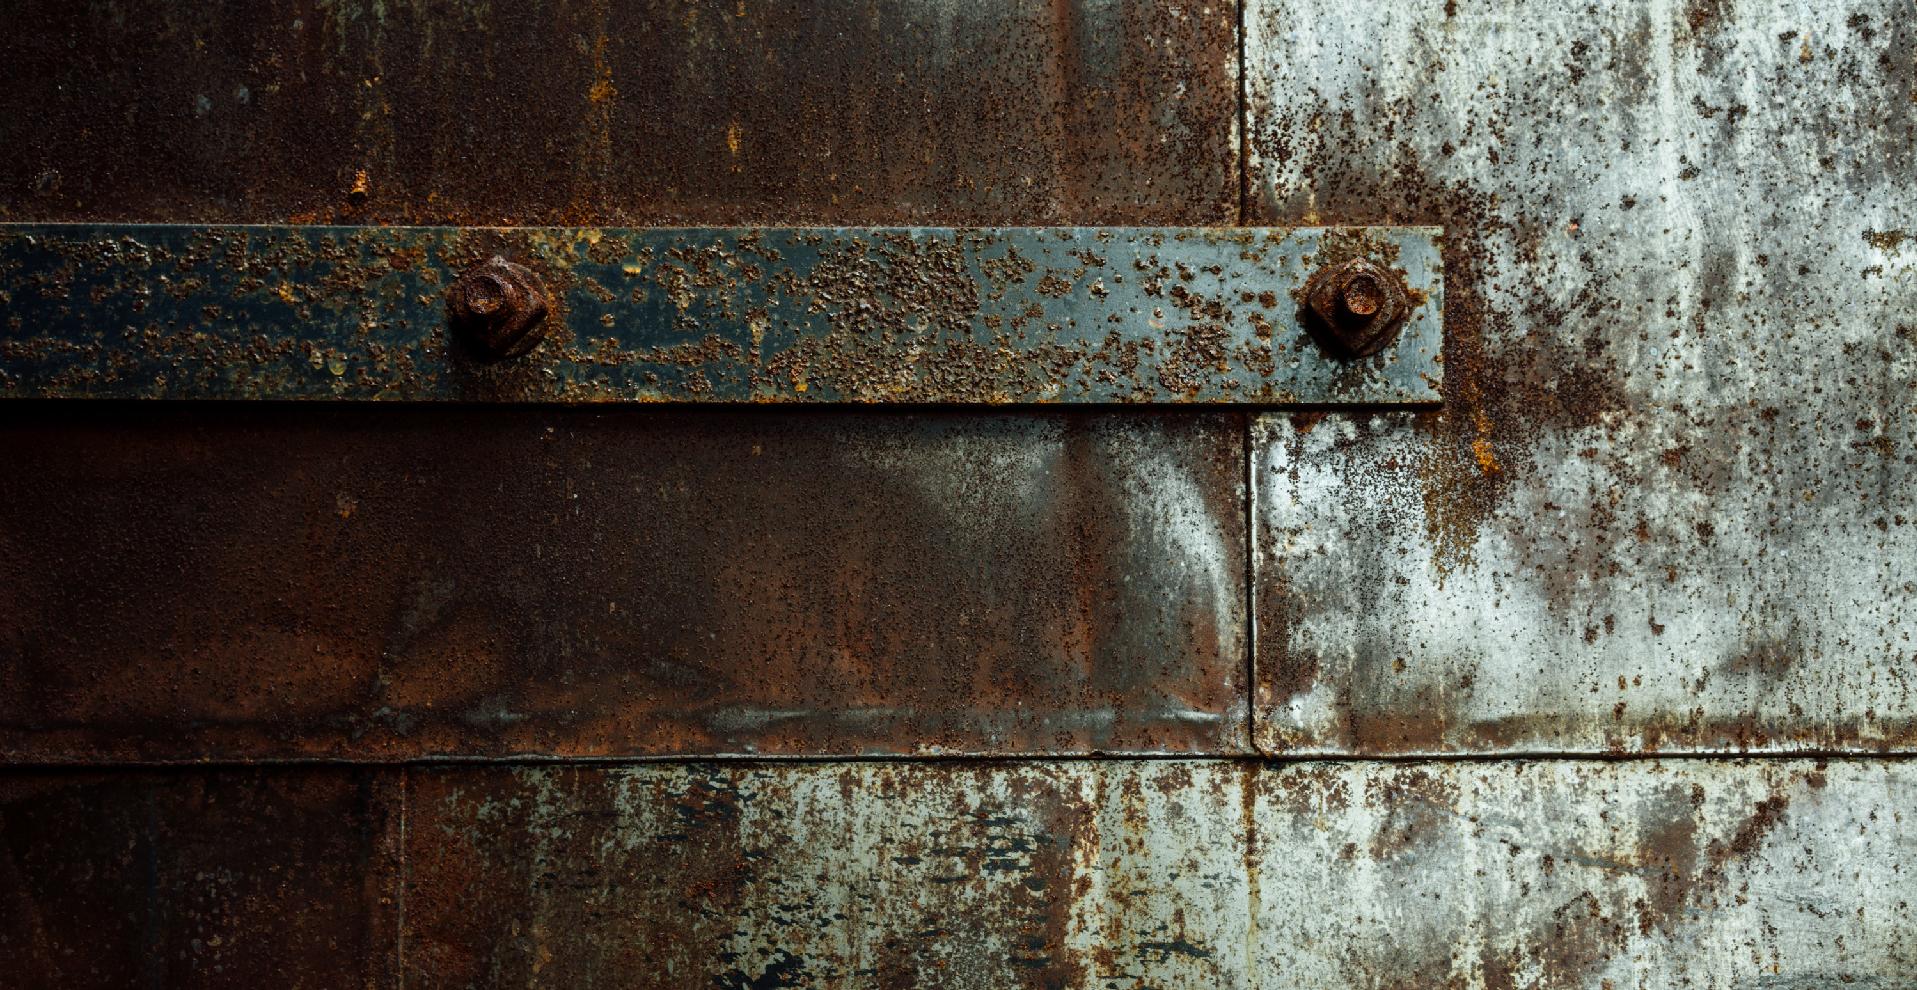 rudd_caves_doors-01.jpg